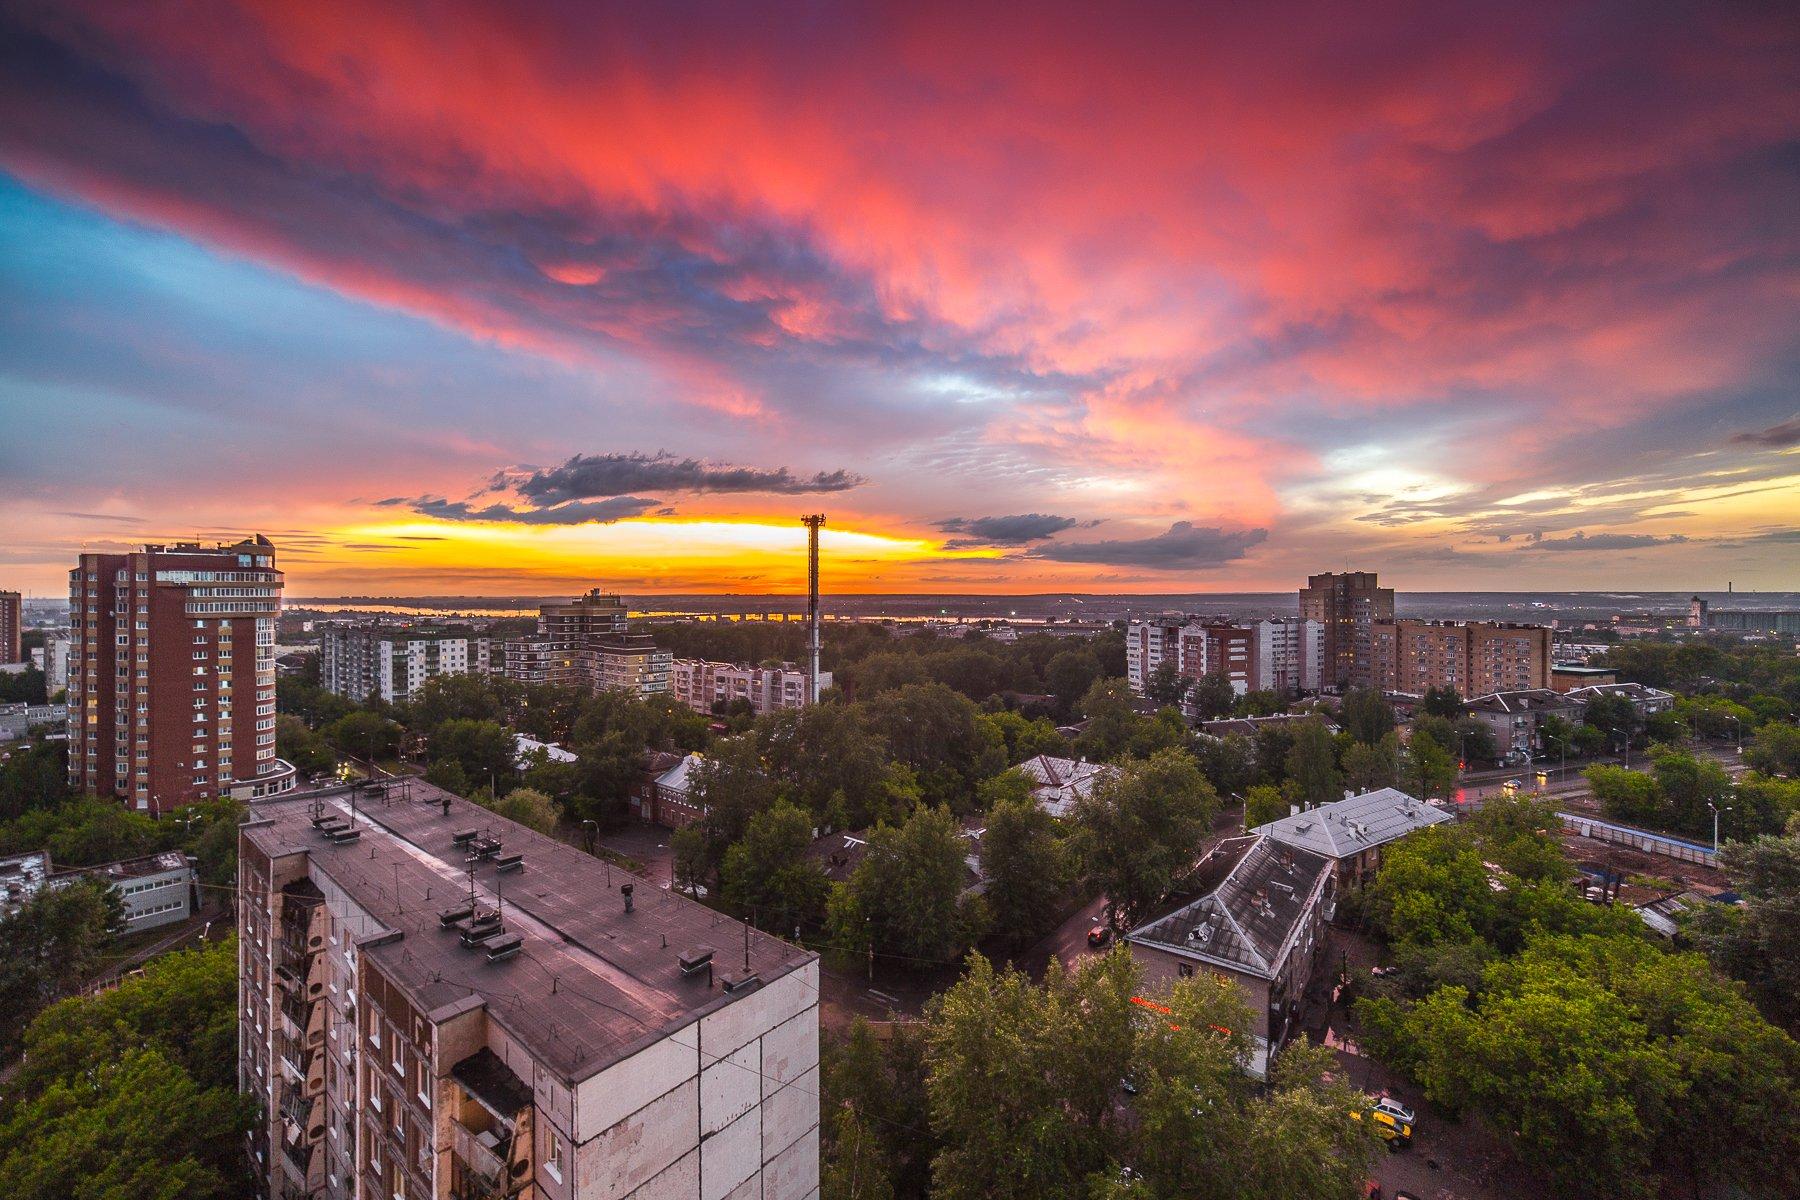 закат Пермь город, Савицкий Ян